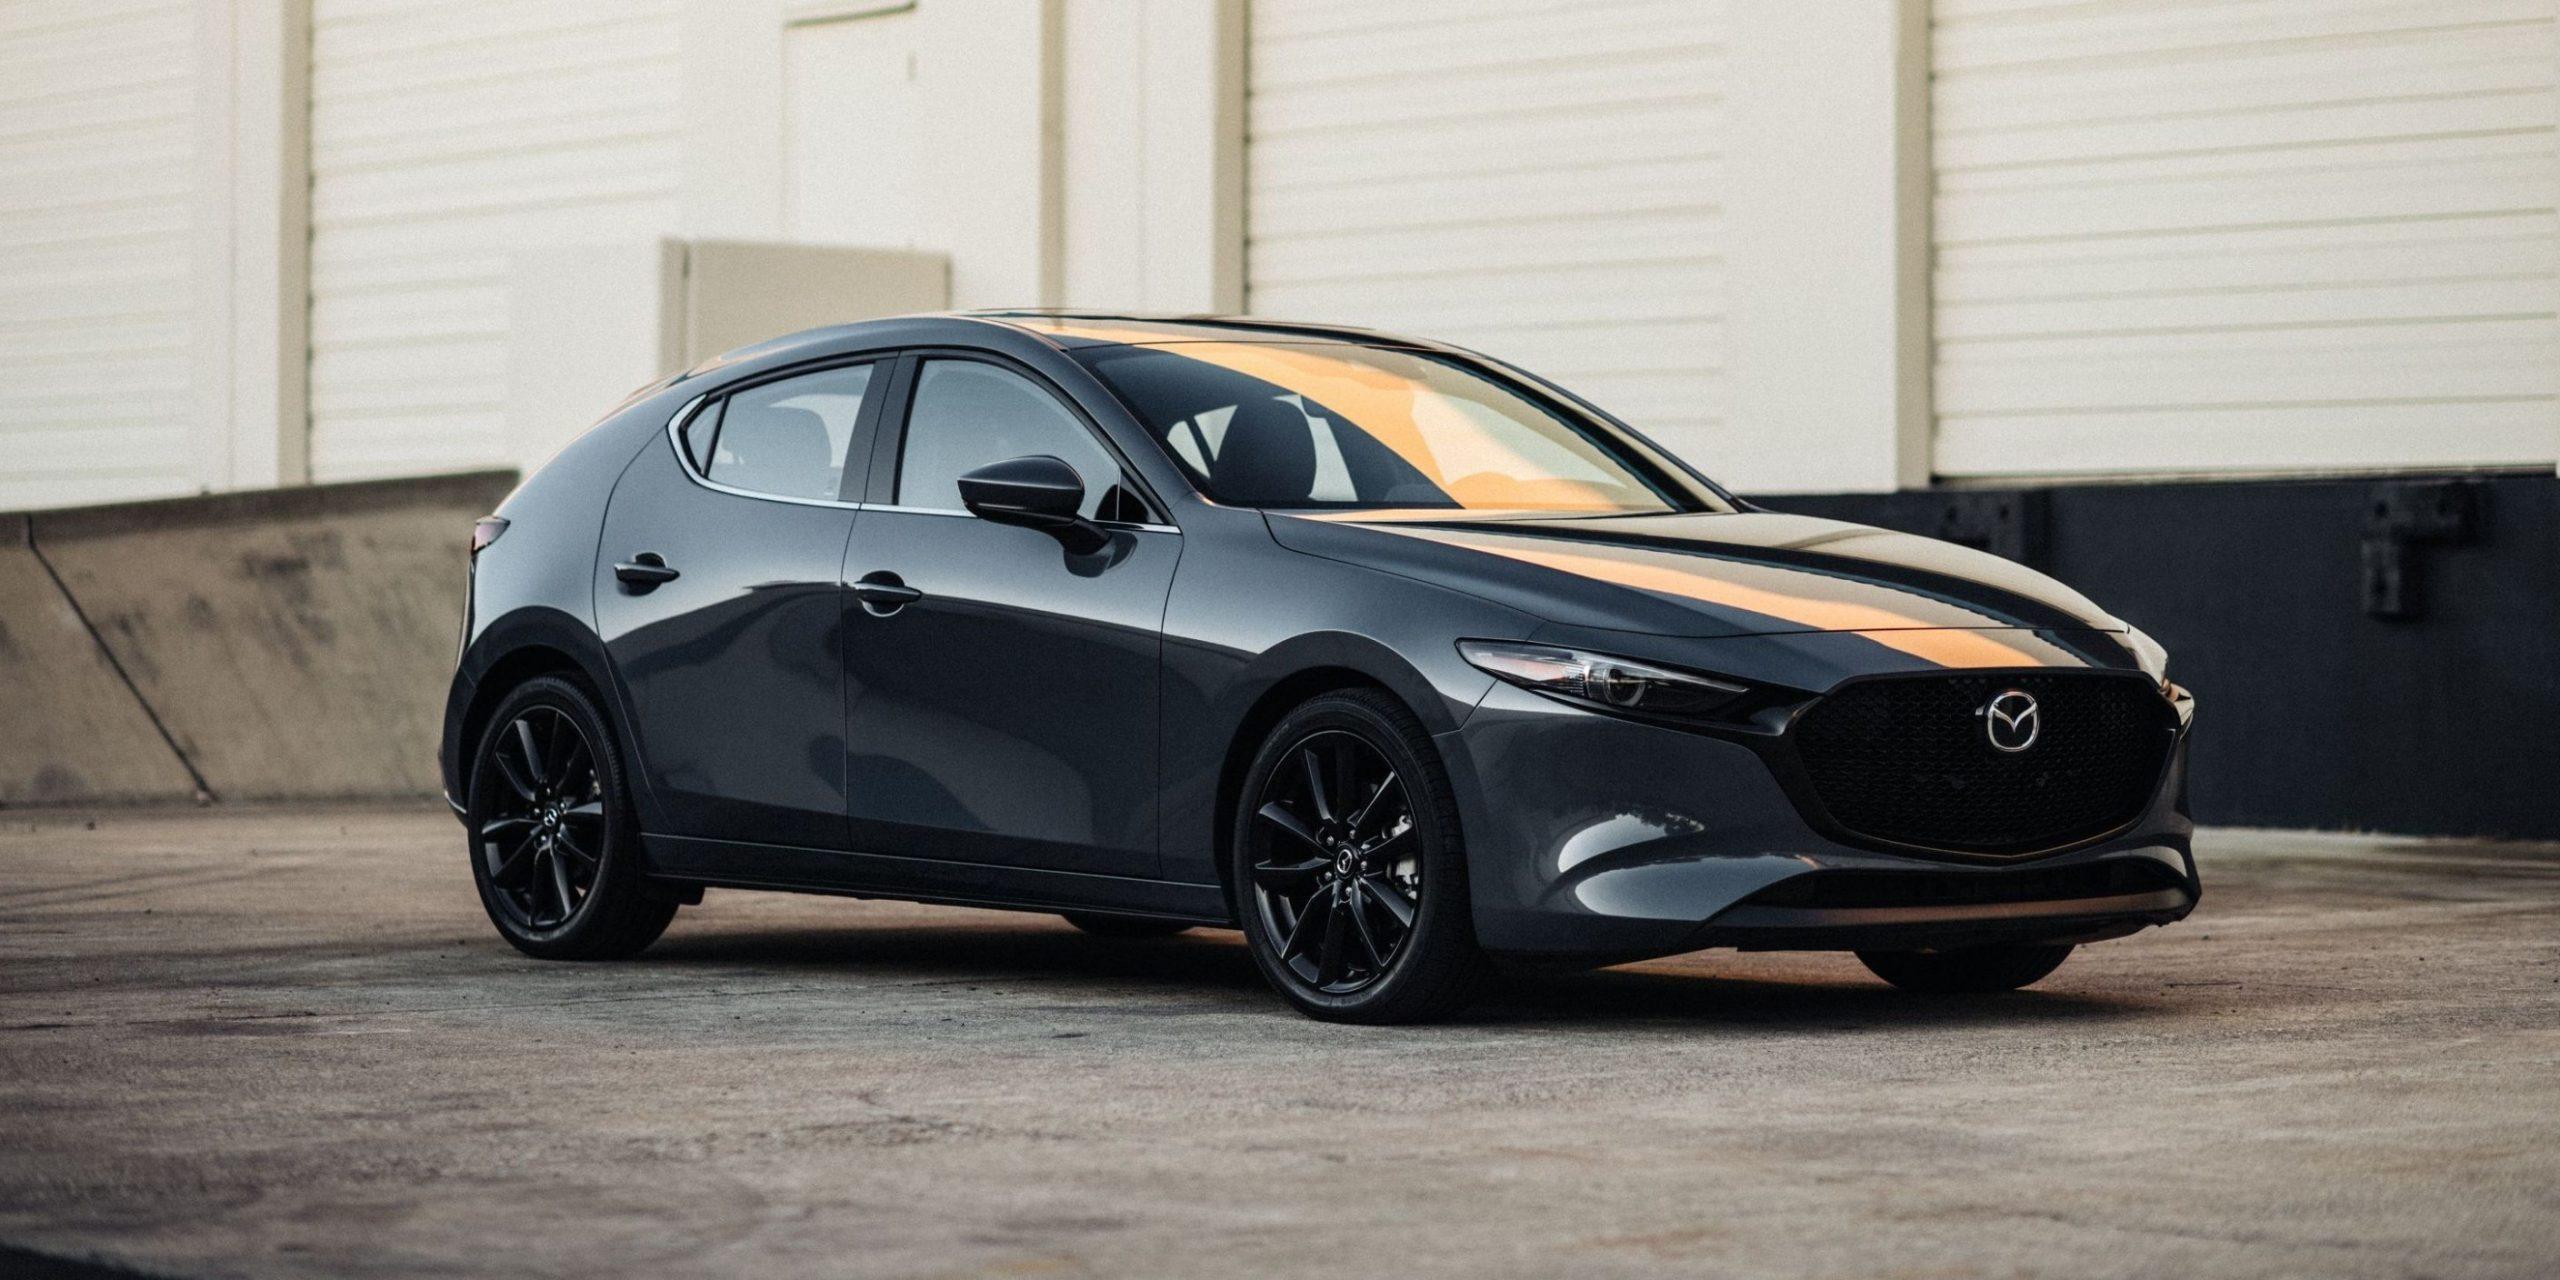 3 Mazda 3 Review, Pricing, and Specs - 2021 Mazda 3 Turbo